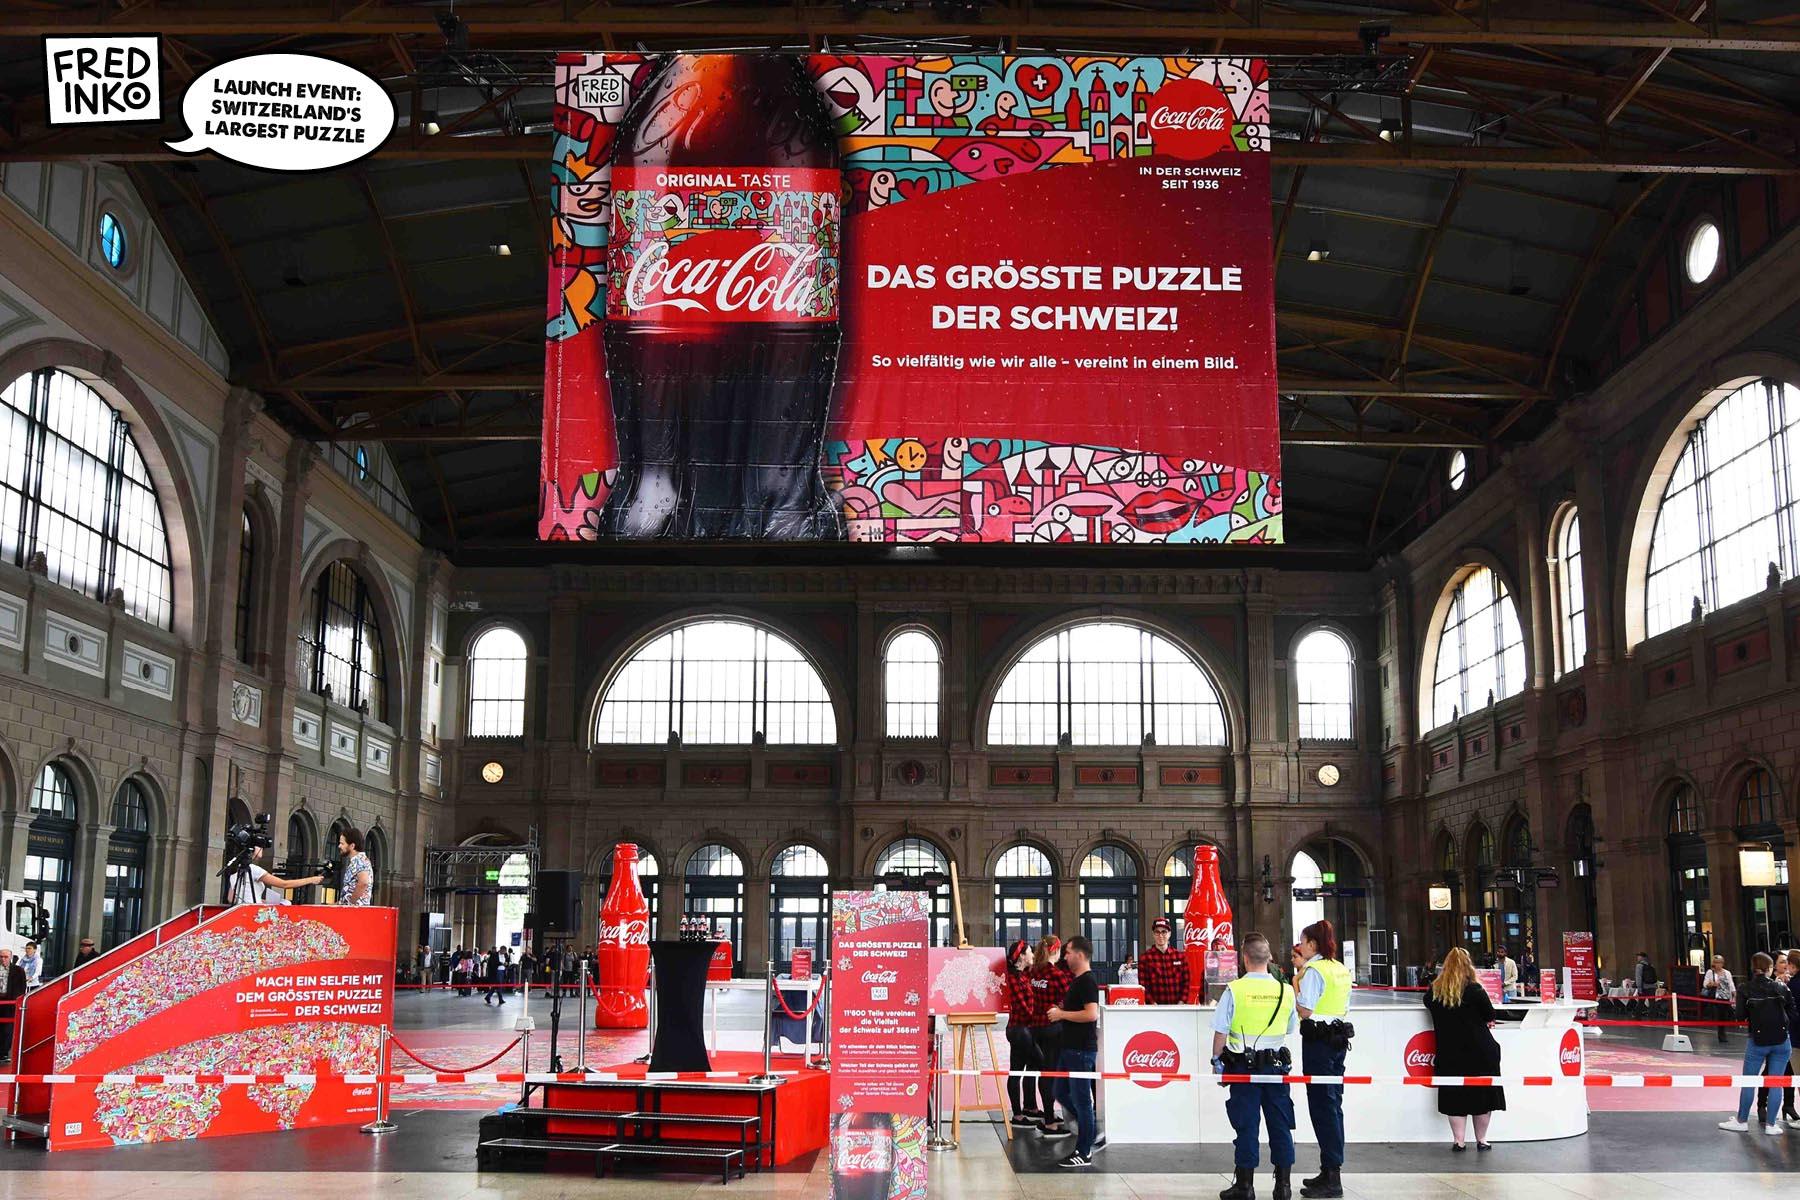 Coke_Fredinko_Doku18.jpg